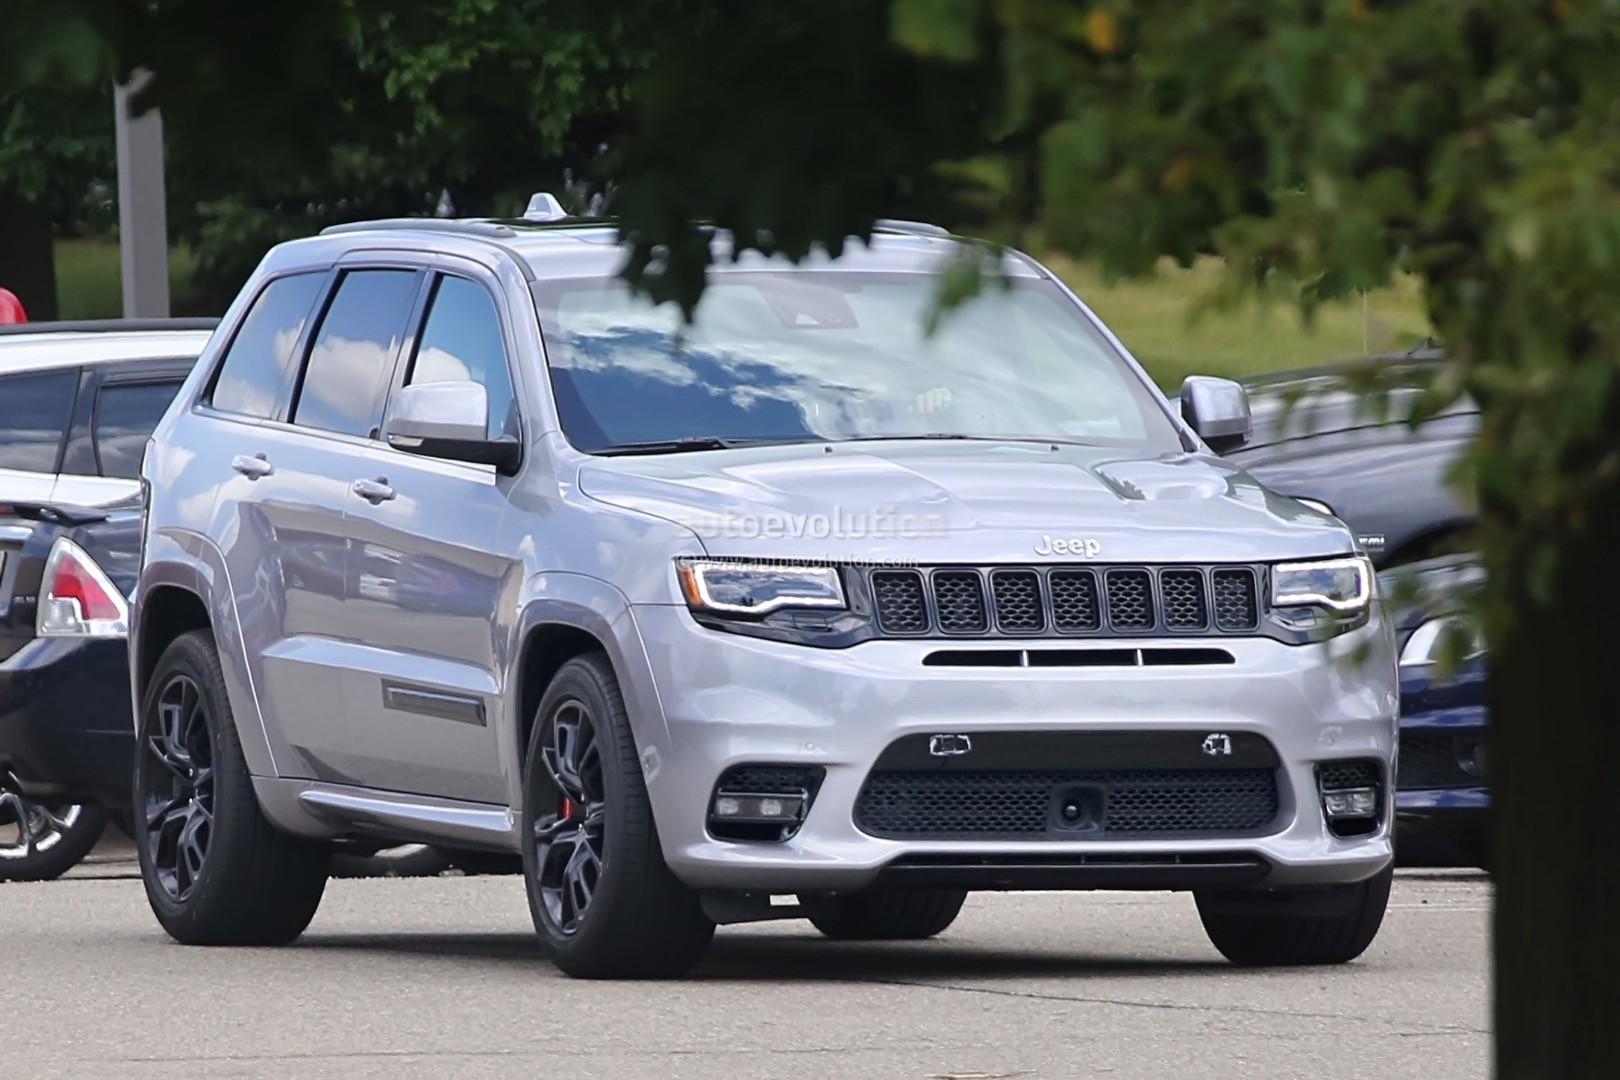 2018 jeep grand cherokee trackhawk confirmed for new york. Black Bedroom Furniture Sets. Home Design Ideas